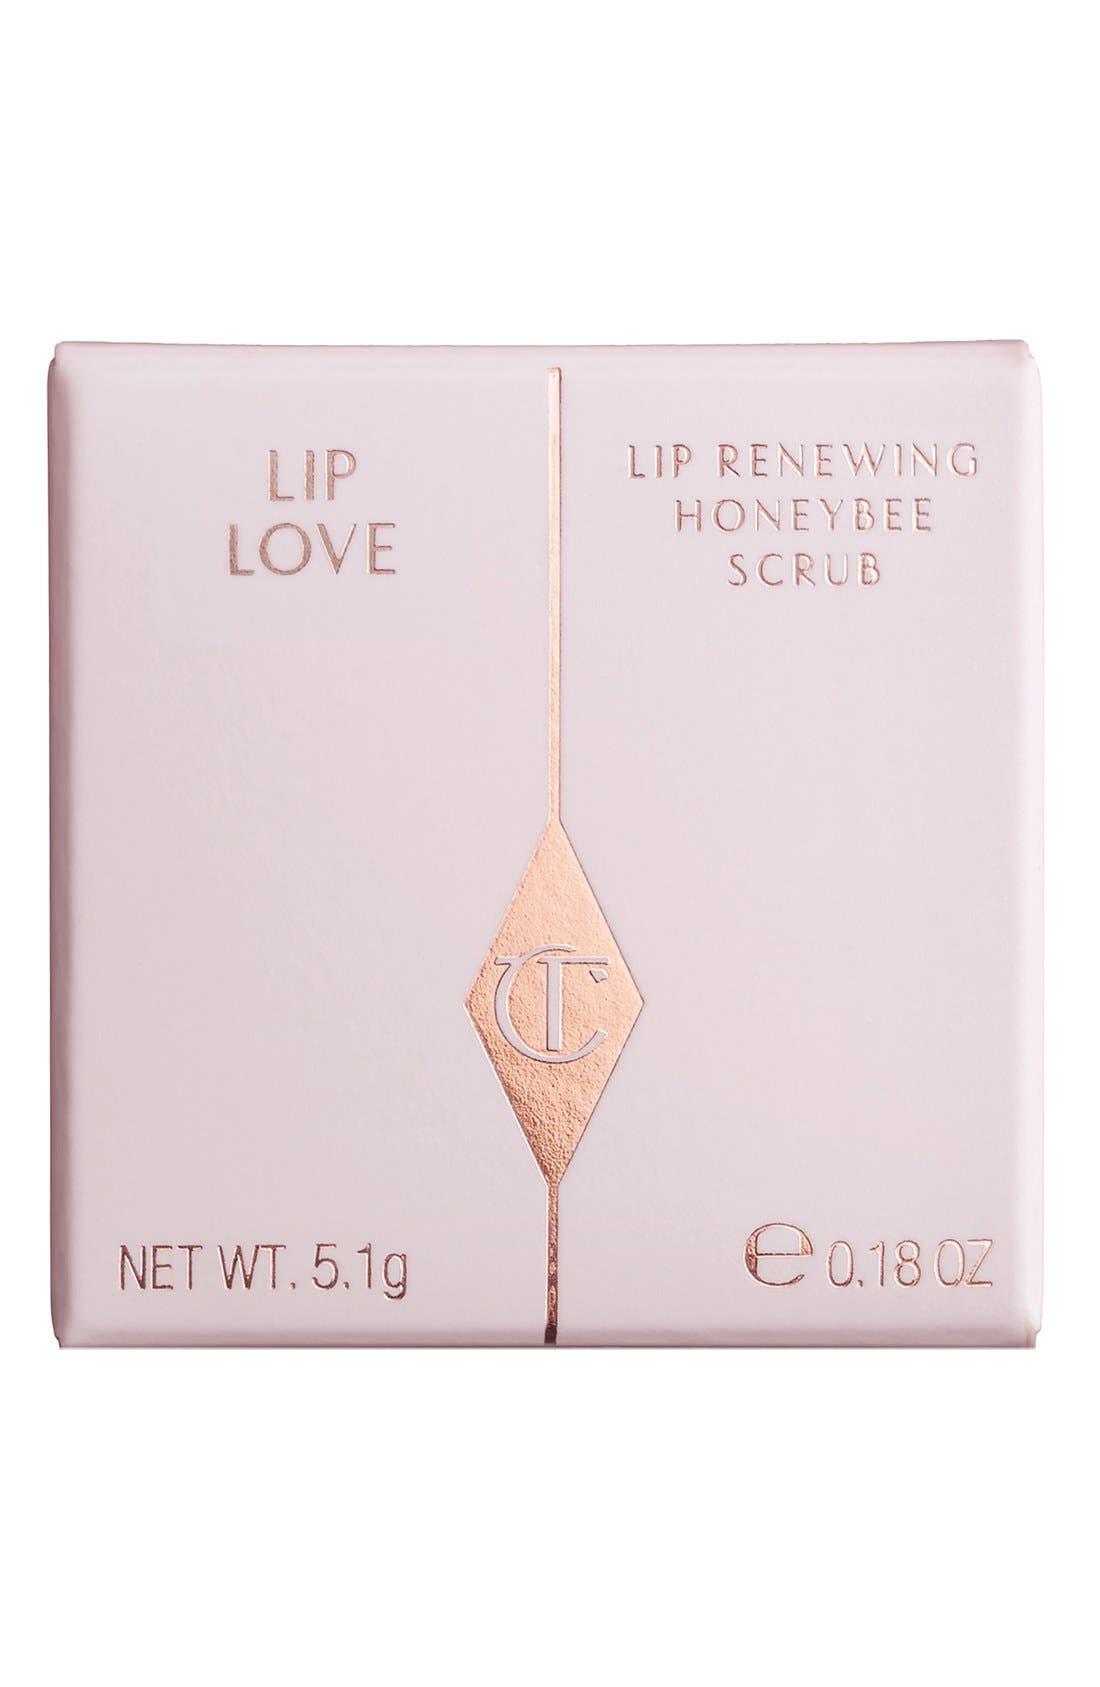 CHARLOTTE TILBURY, Lip Love Lip Renewing Honeybee Scrub, Alternate thumbnail 4, color, 000